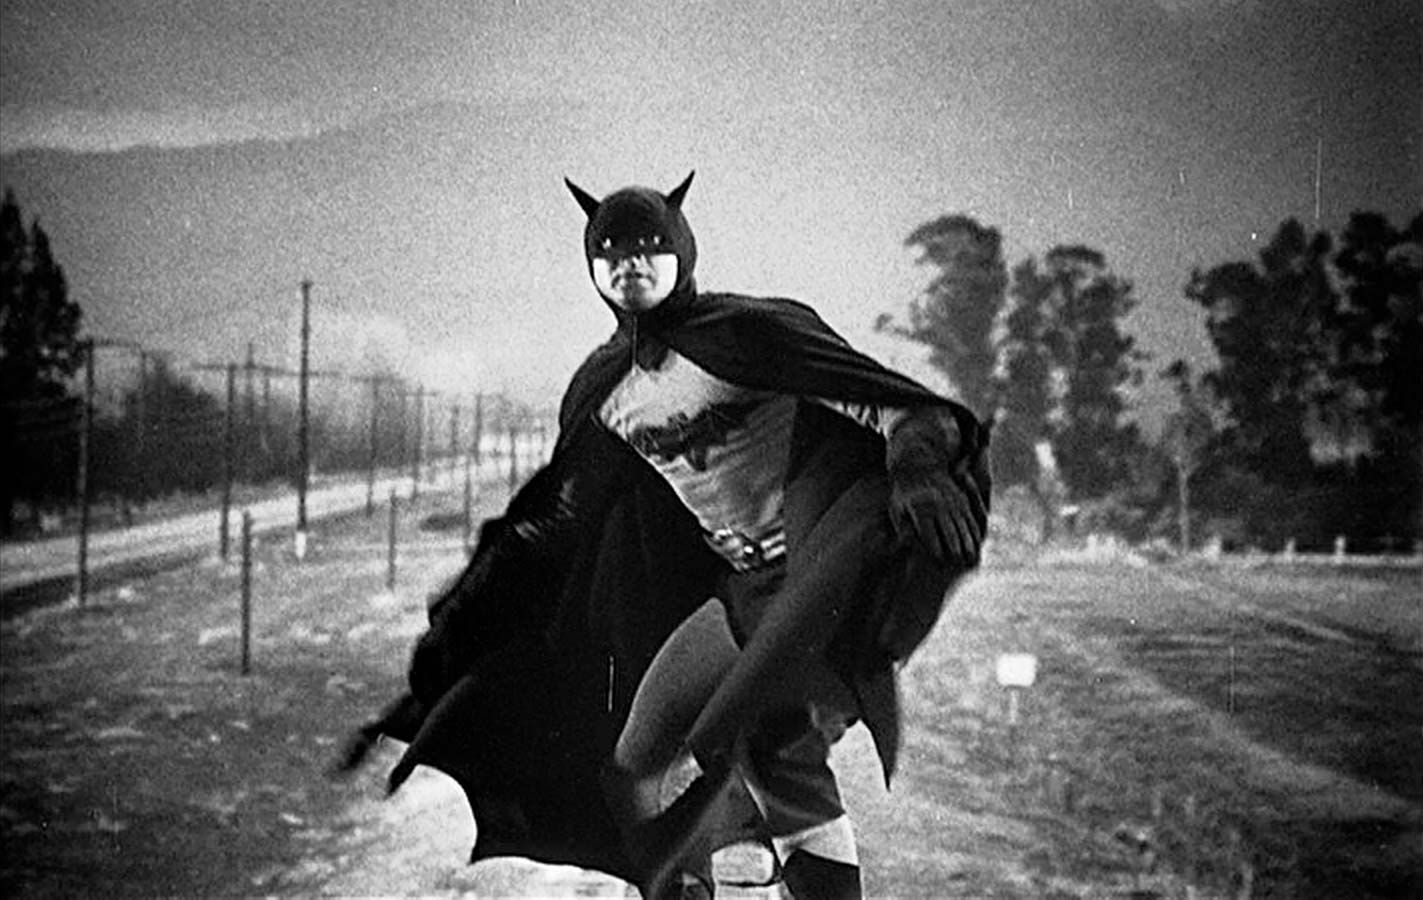 Risultati immagini per 2. Robert Lowery, Batman & Robin 1949